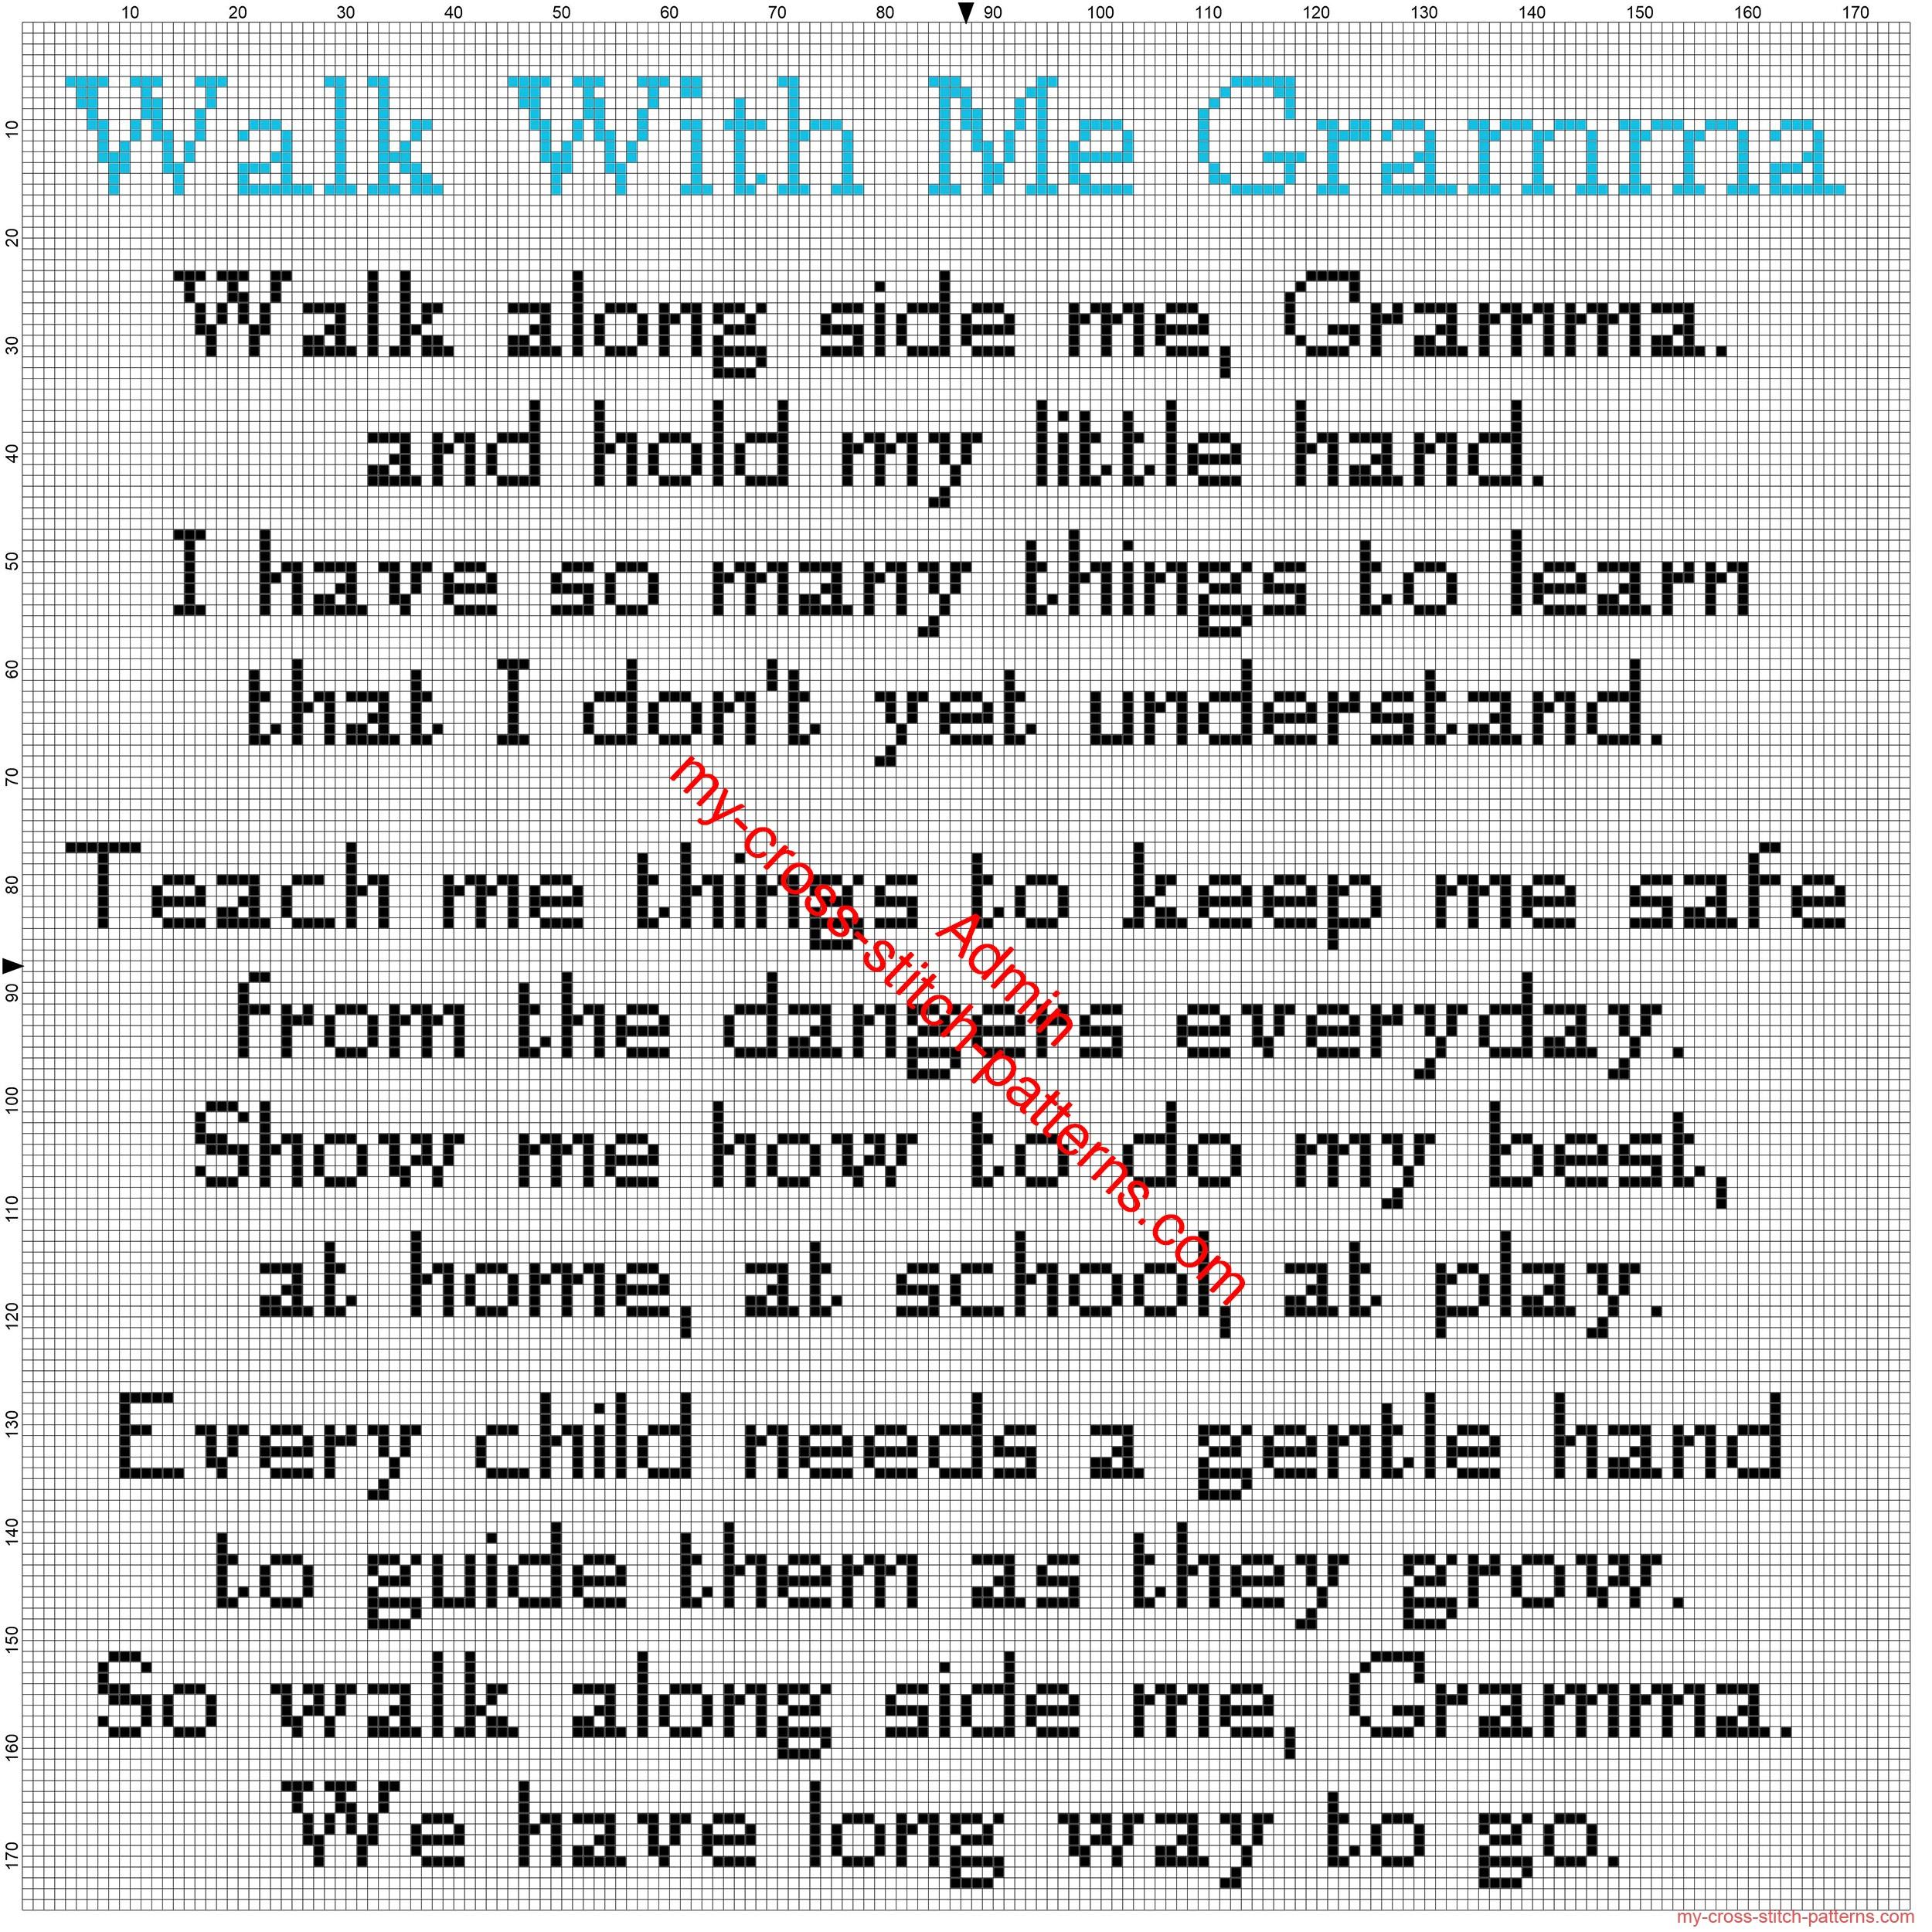 walk_with_me_gramma_poetry_sentence_free_cross_stitch_pattern